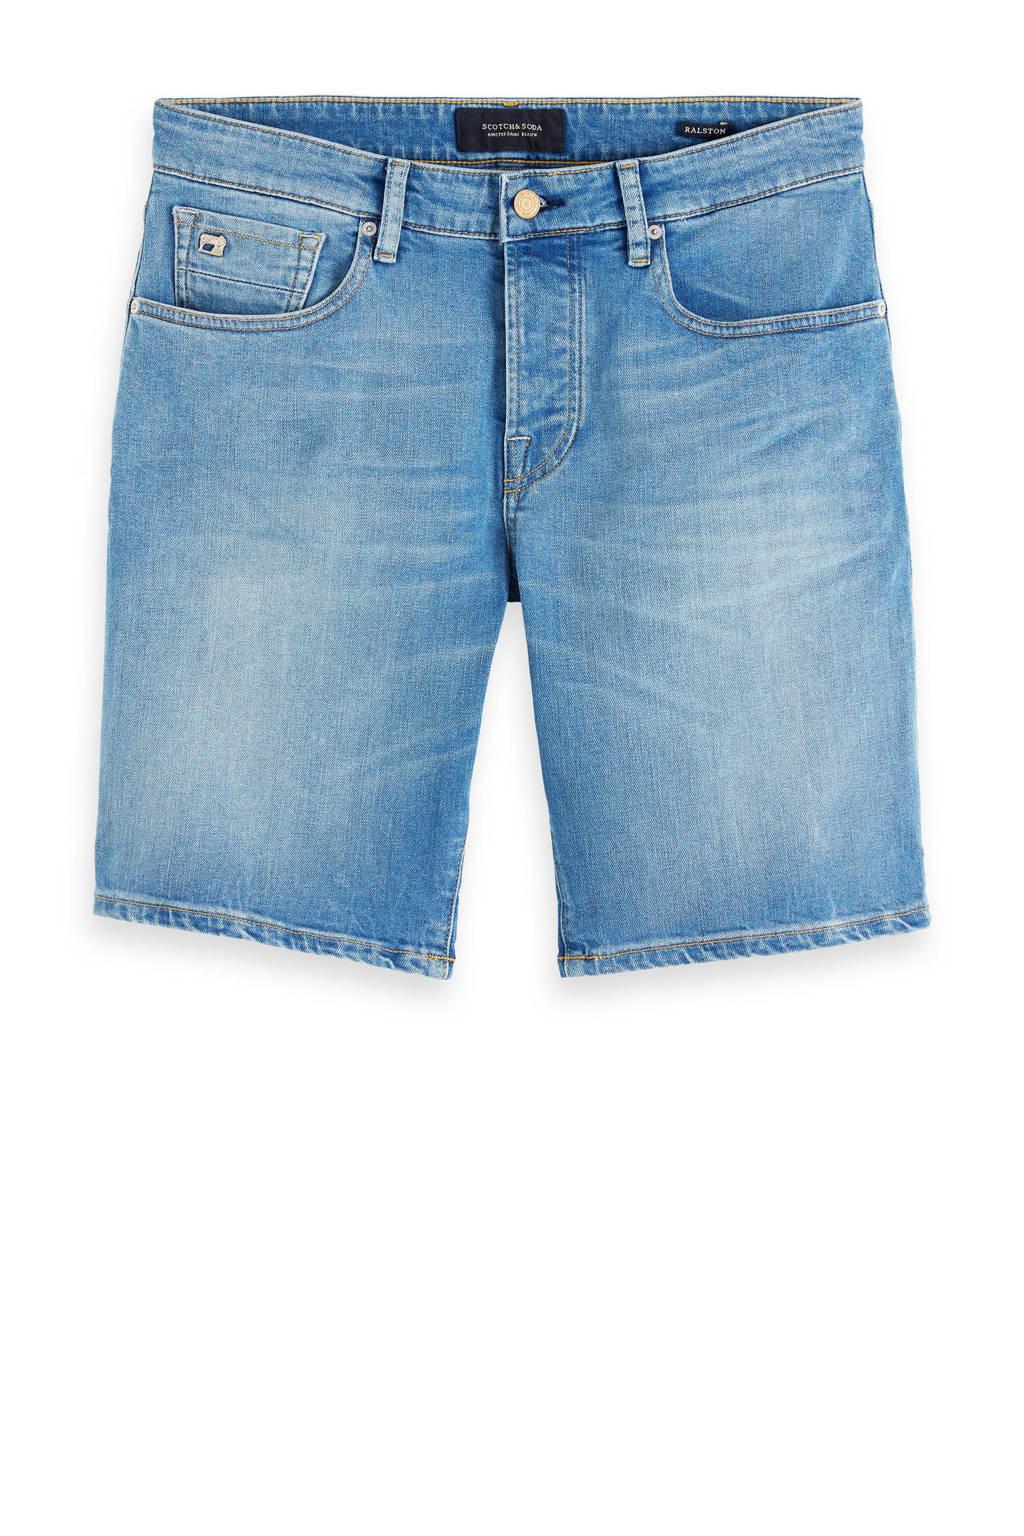 Scotch & Soda Amsterdams Blauw regular fit jeans short home grown, Home Grown